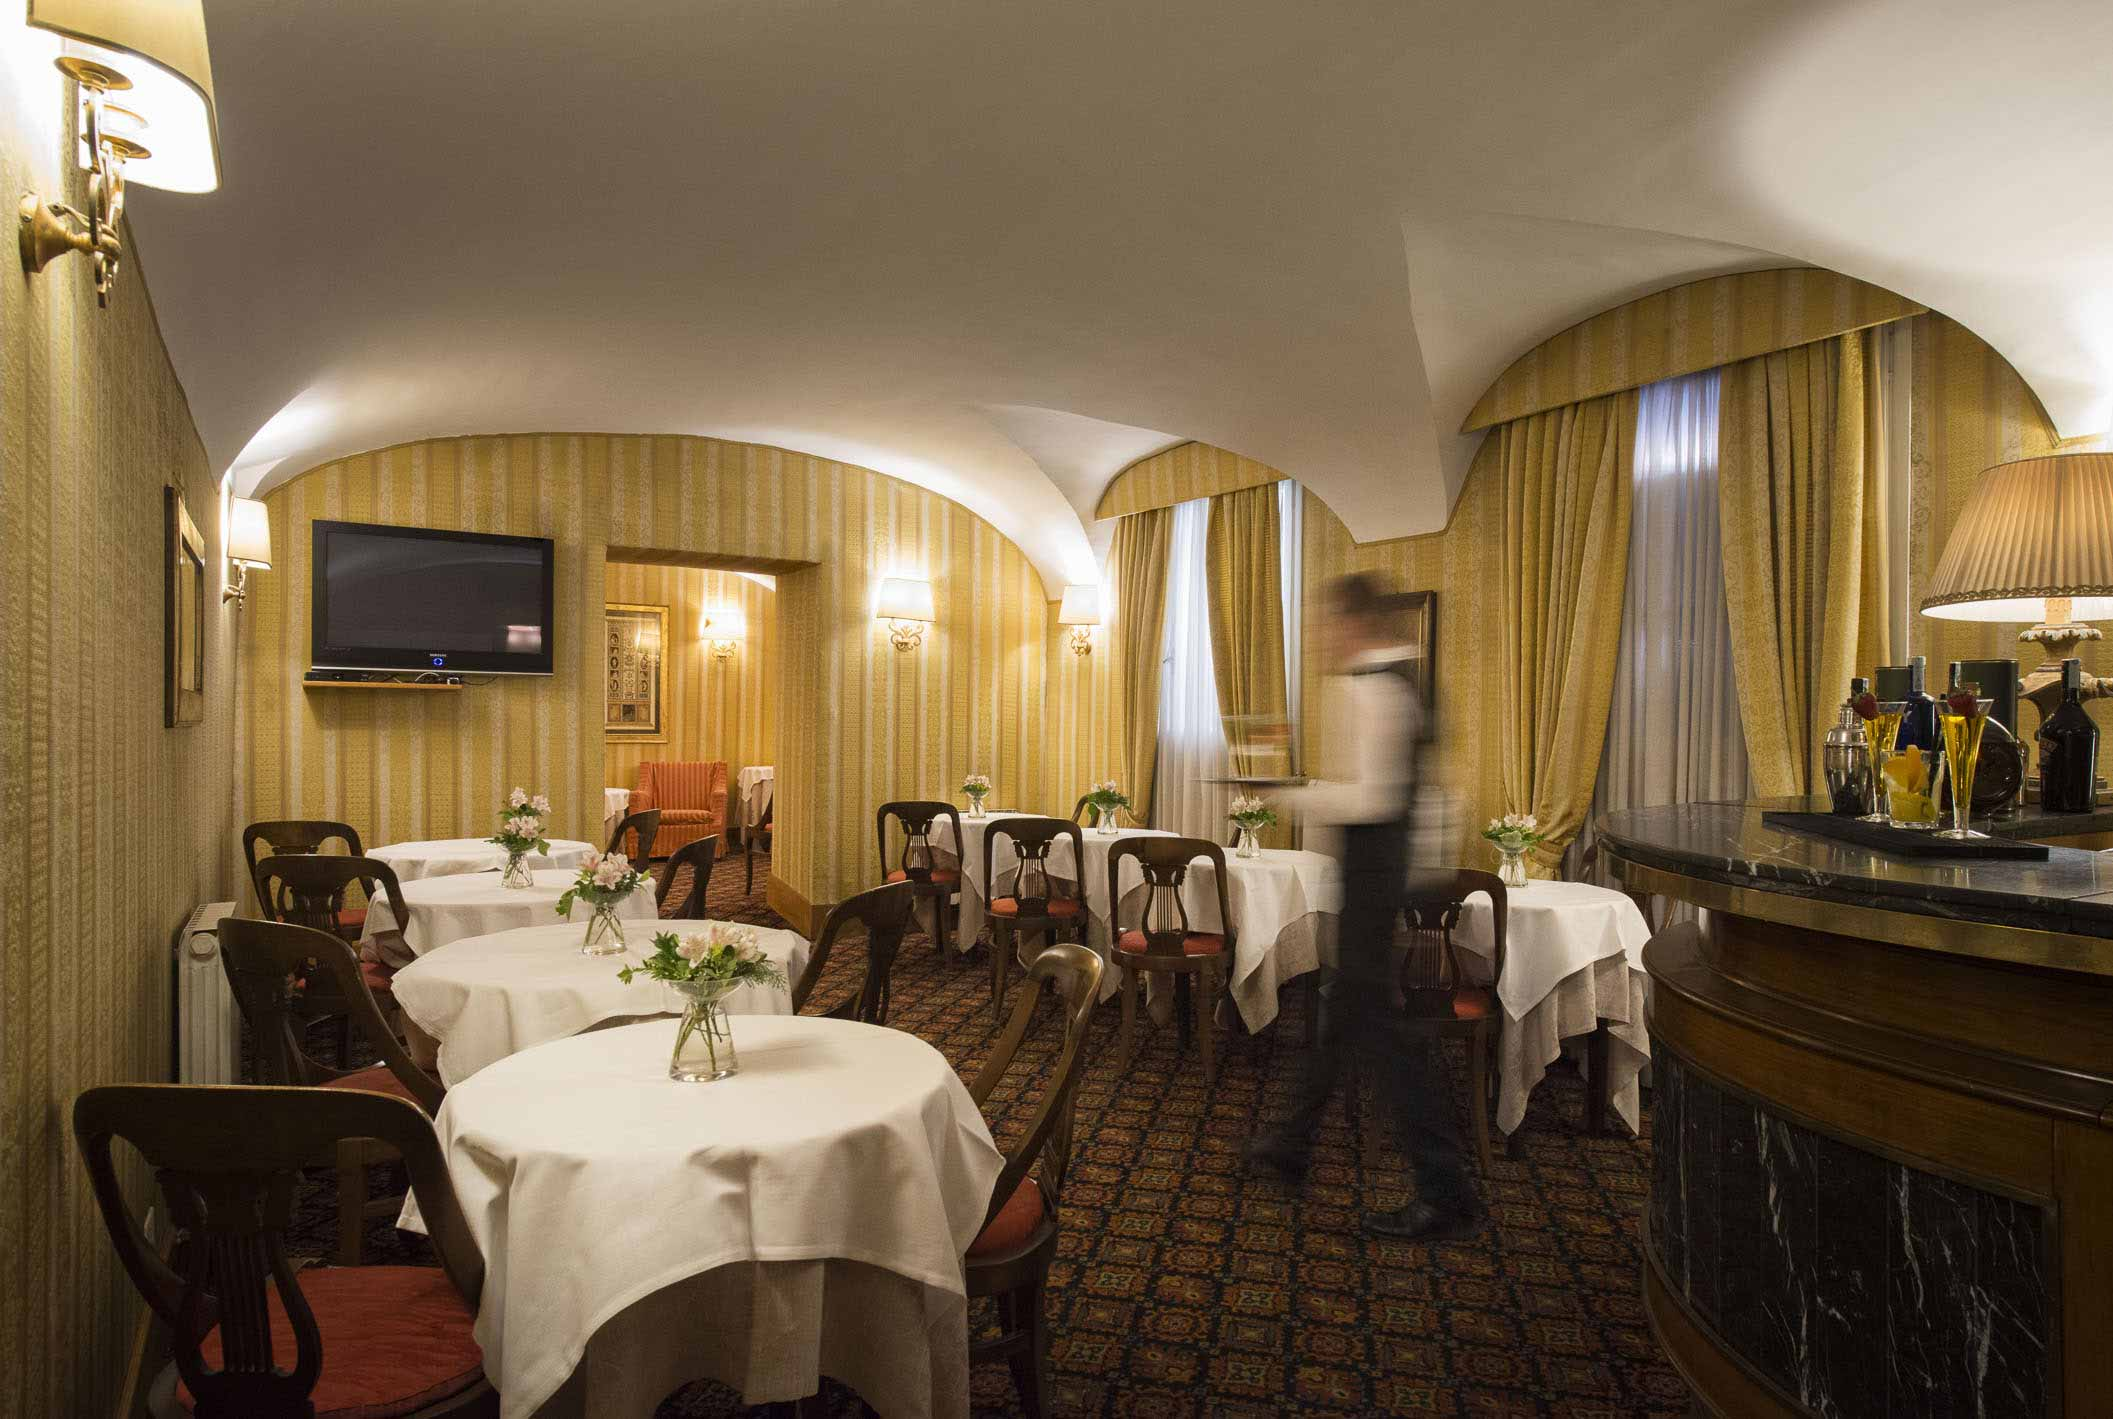 Fotografo per hotel a Roma – Atlante Garden #12